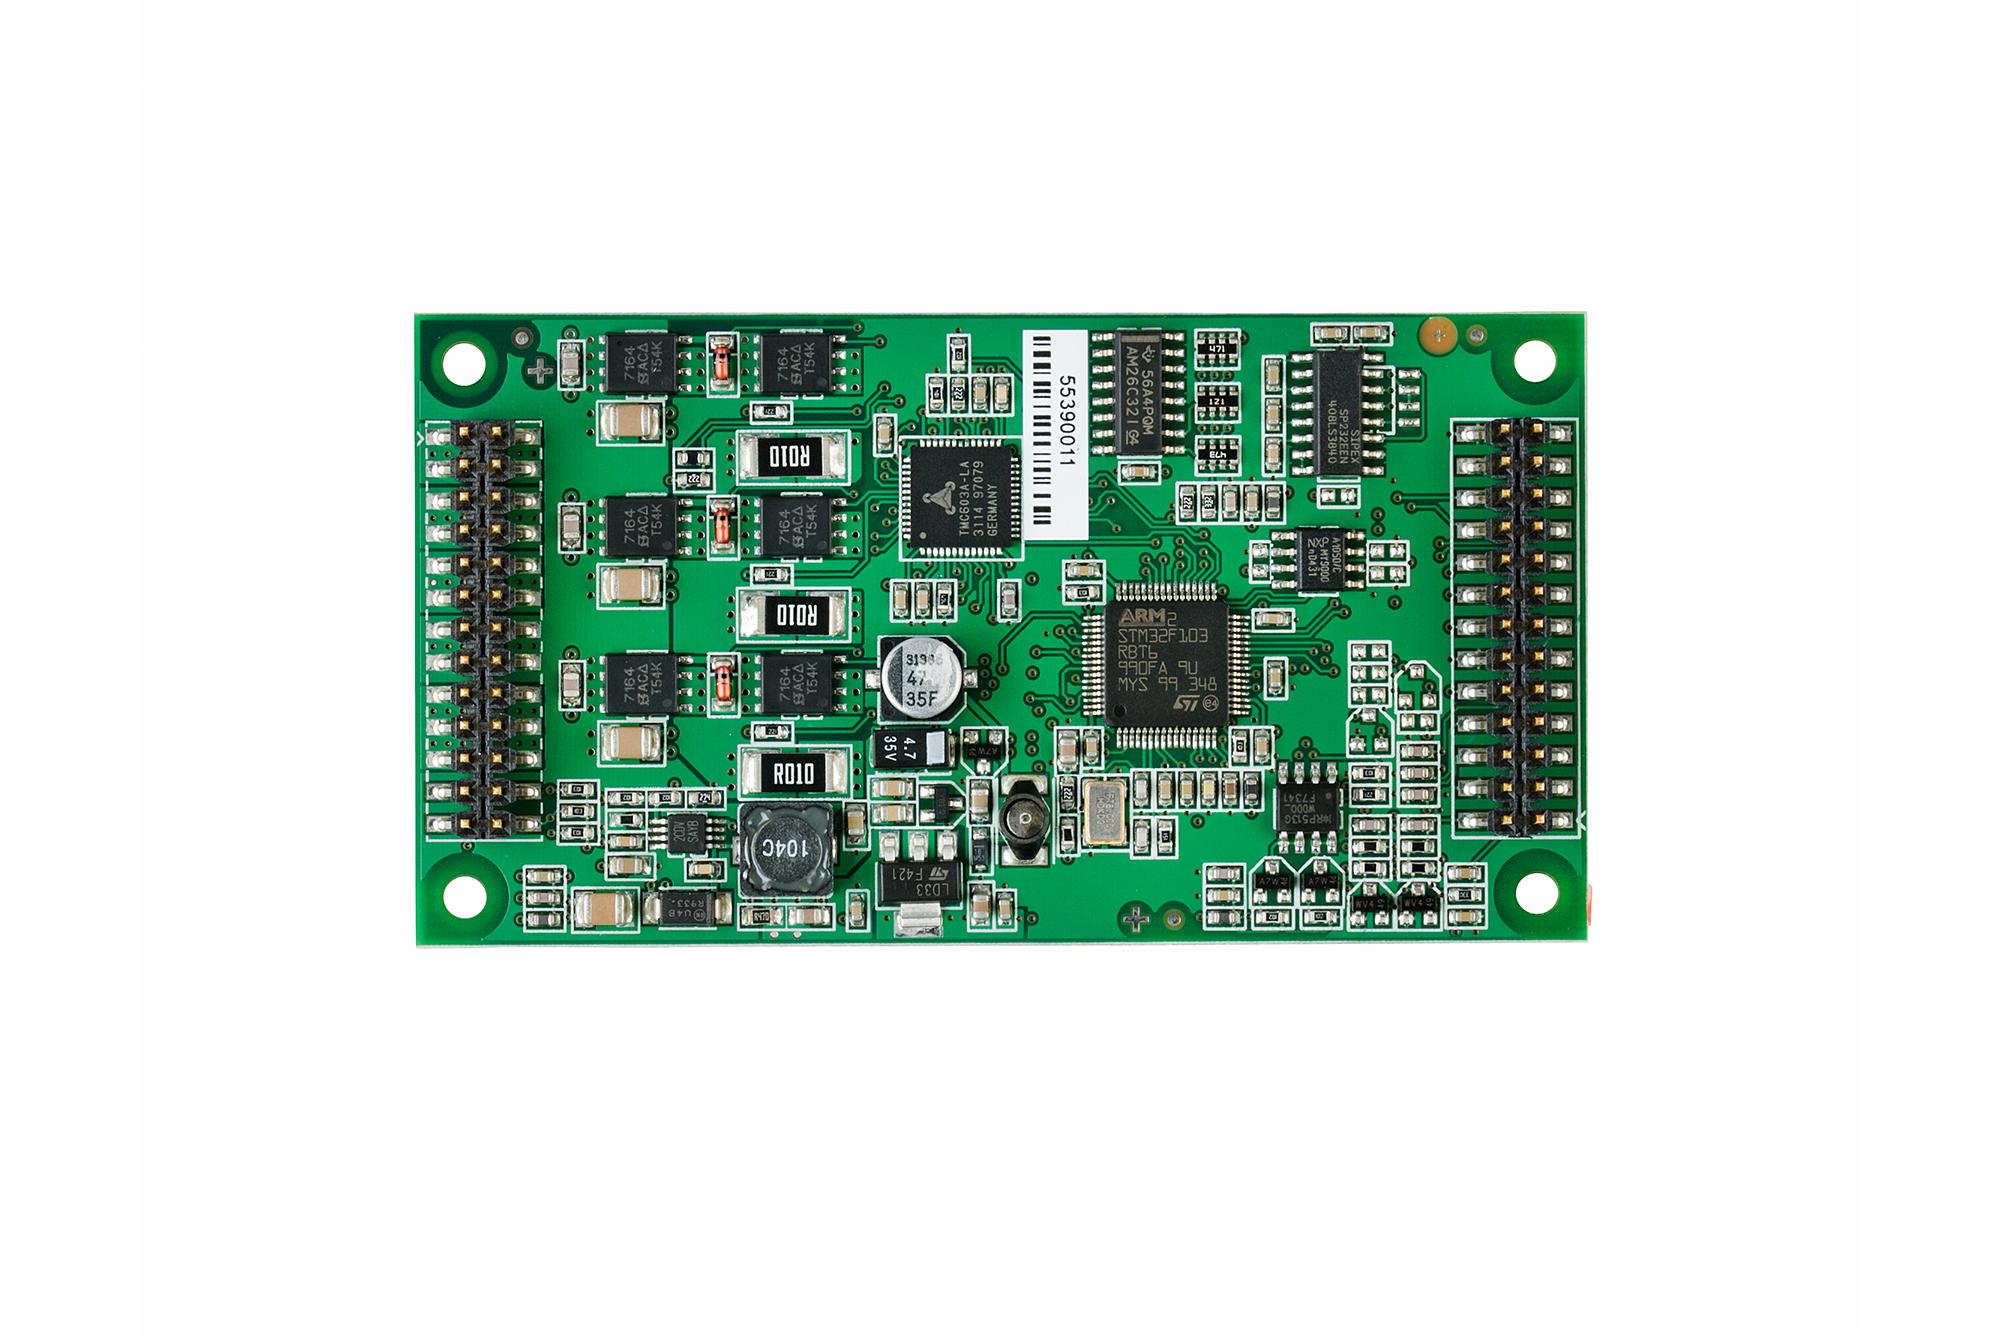 TMCM-1633-CANopen - New CANopen Servo Controller - Trinamic